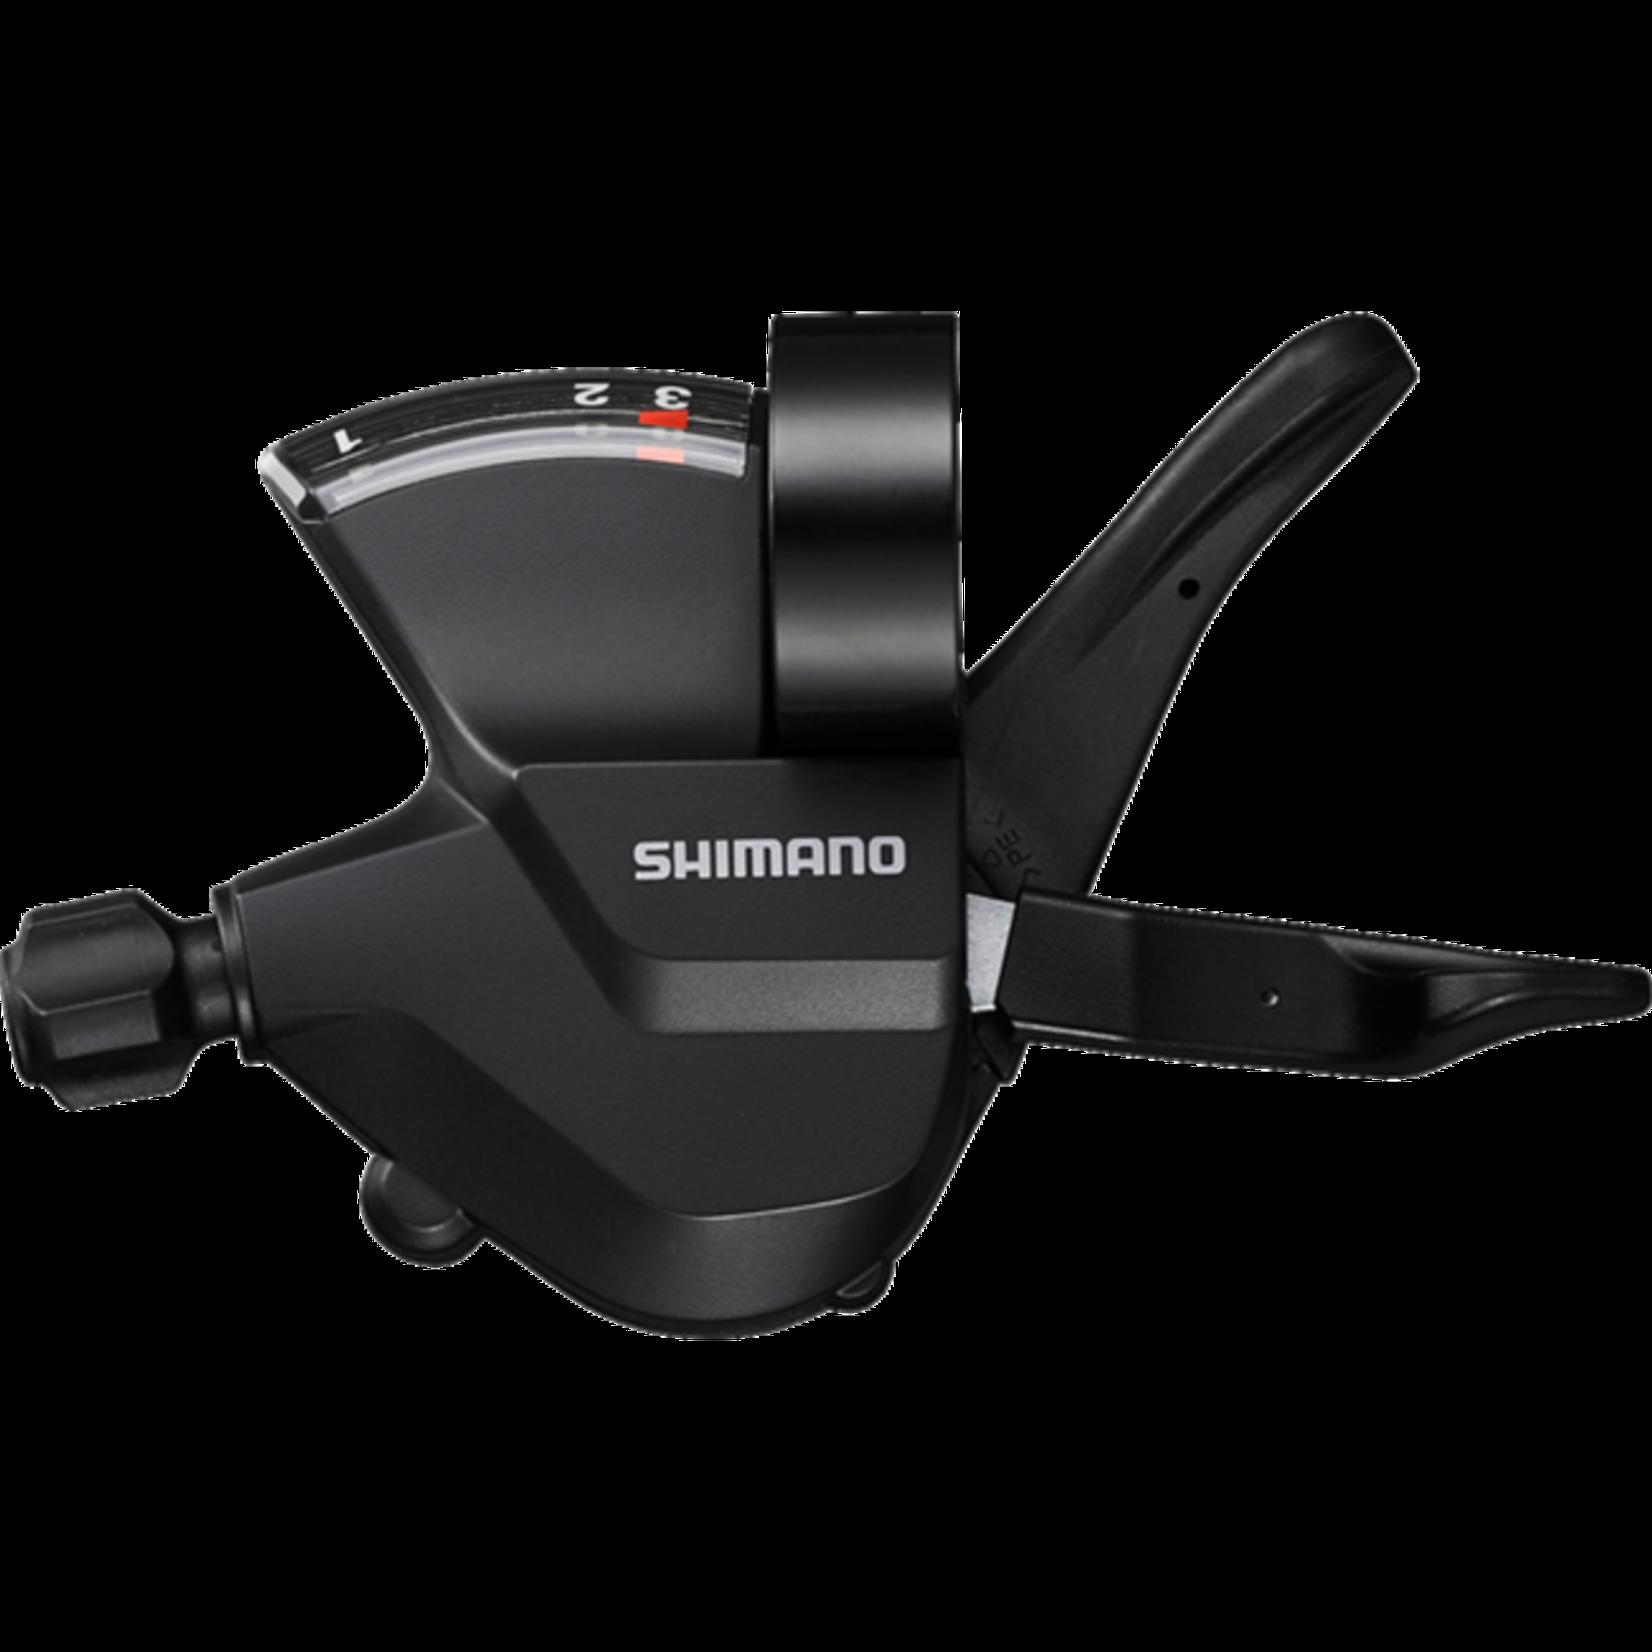 Shimano SL-M315-L, LEFT, 3-SPEED RAPIDFIRE PLUS, W/ OPTICAL GEAR DISPLAY